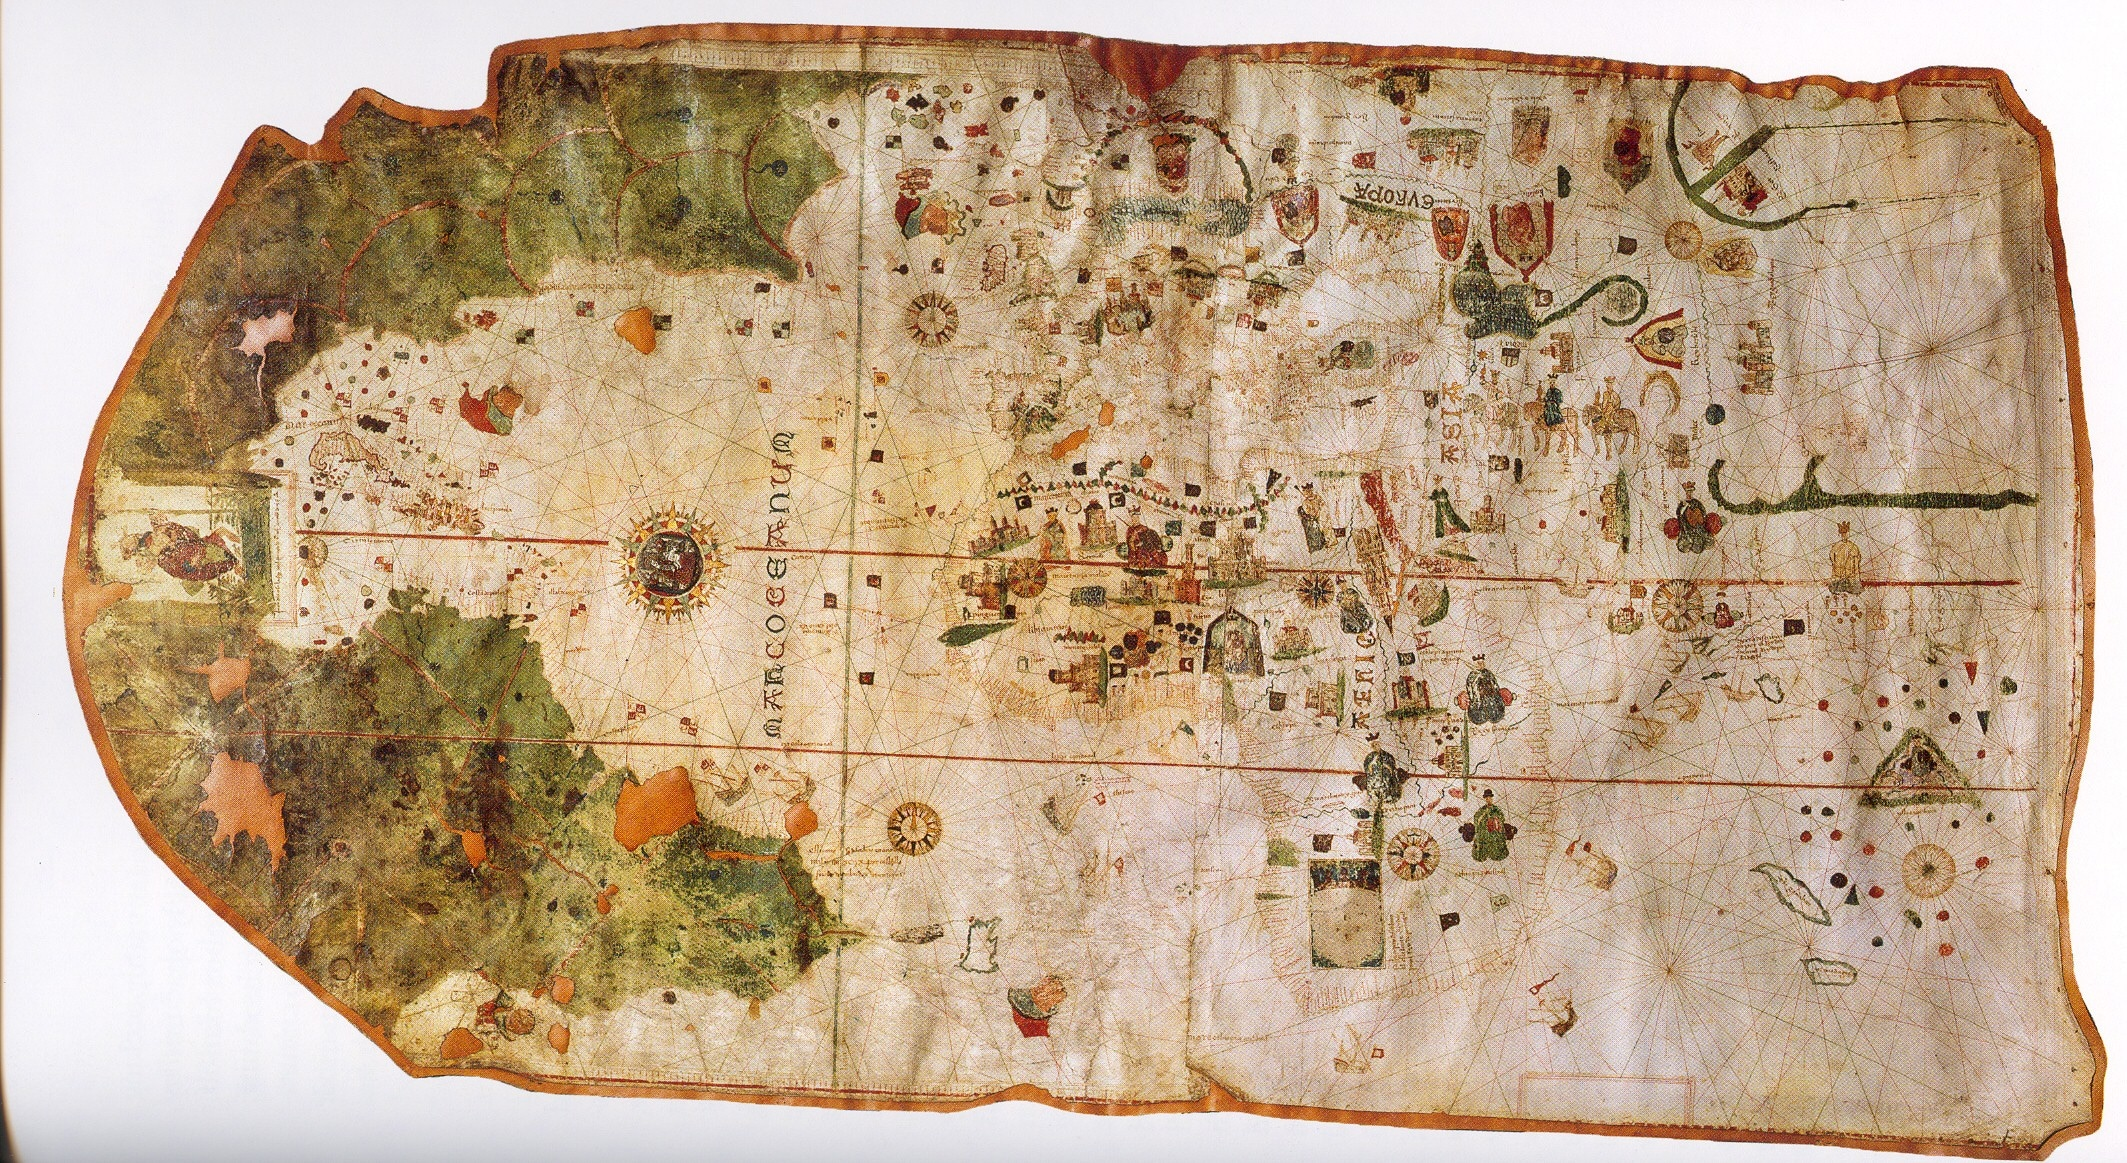 1500 map created by Juan de La Cosa